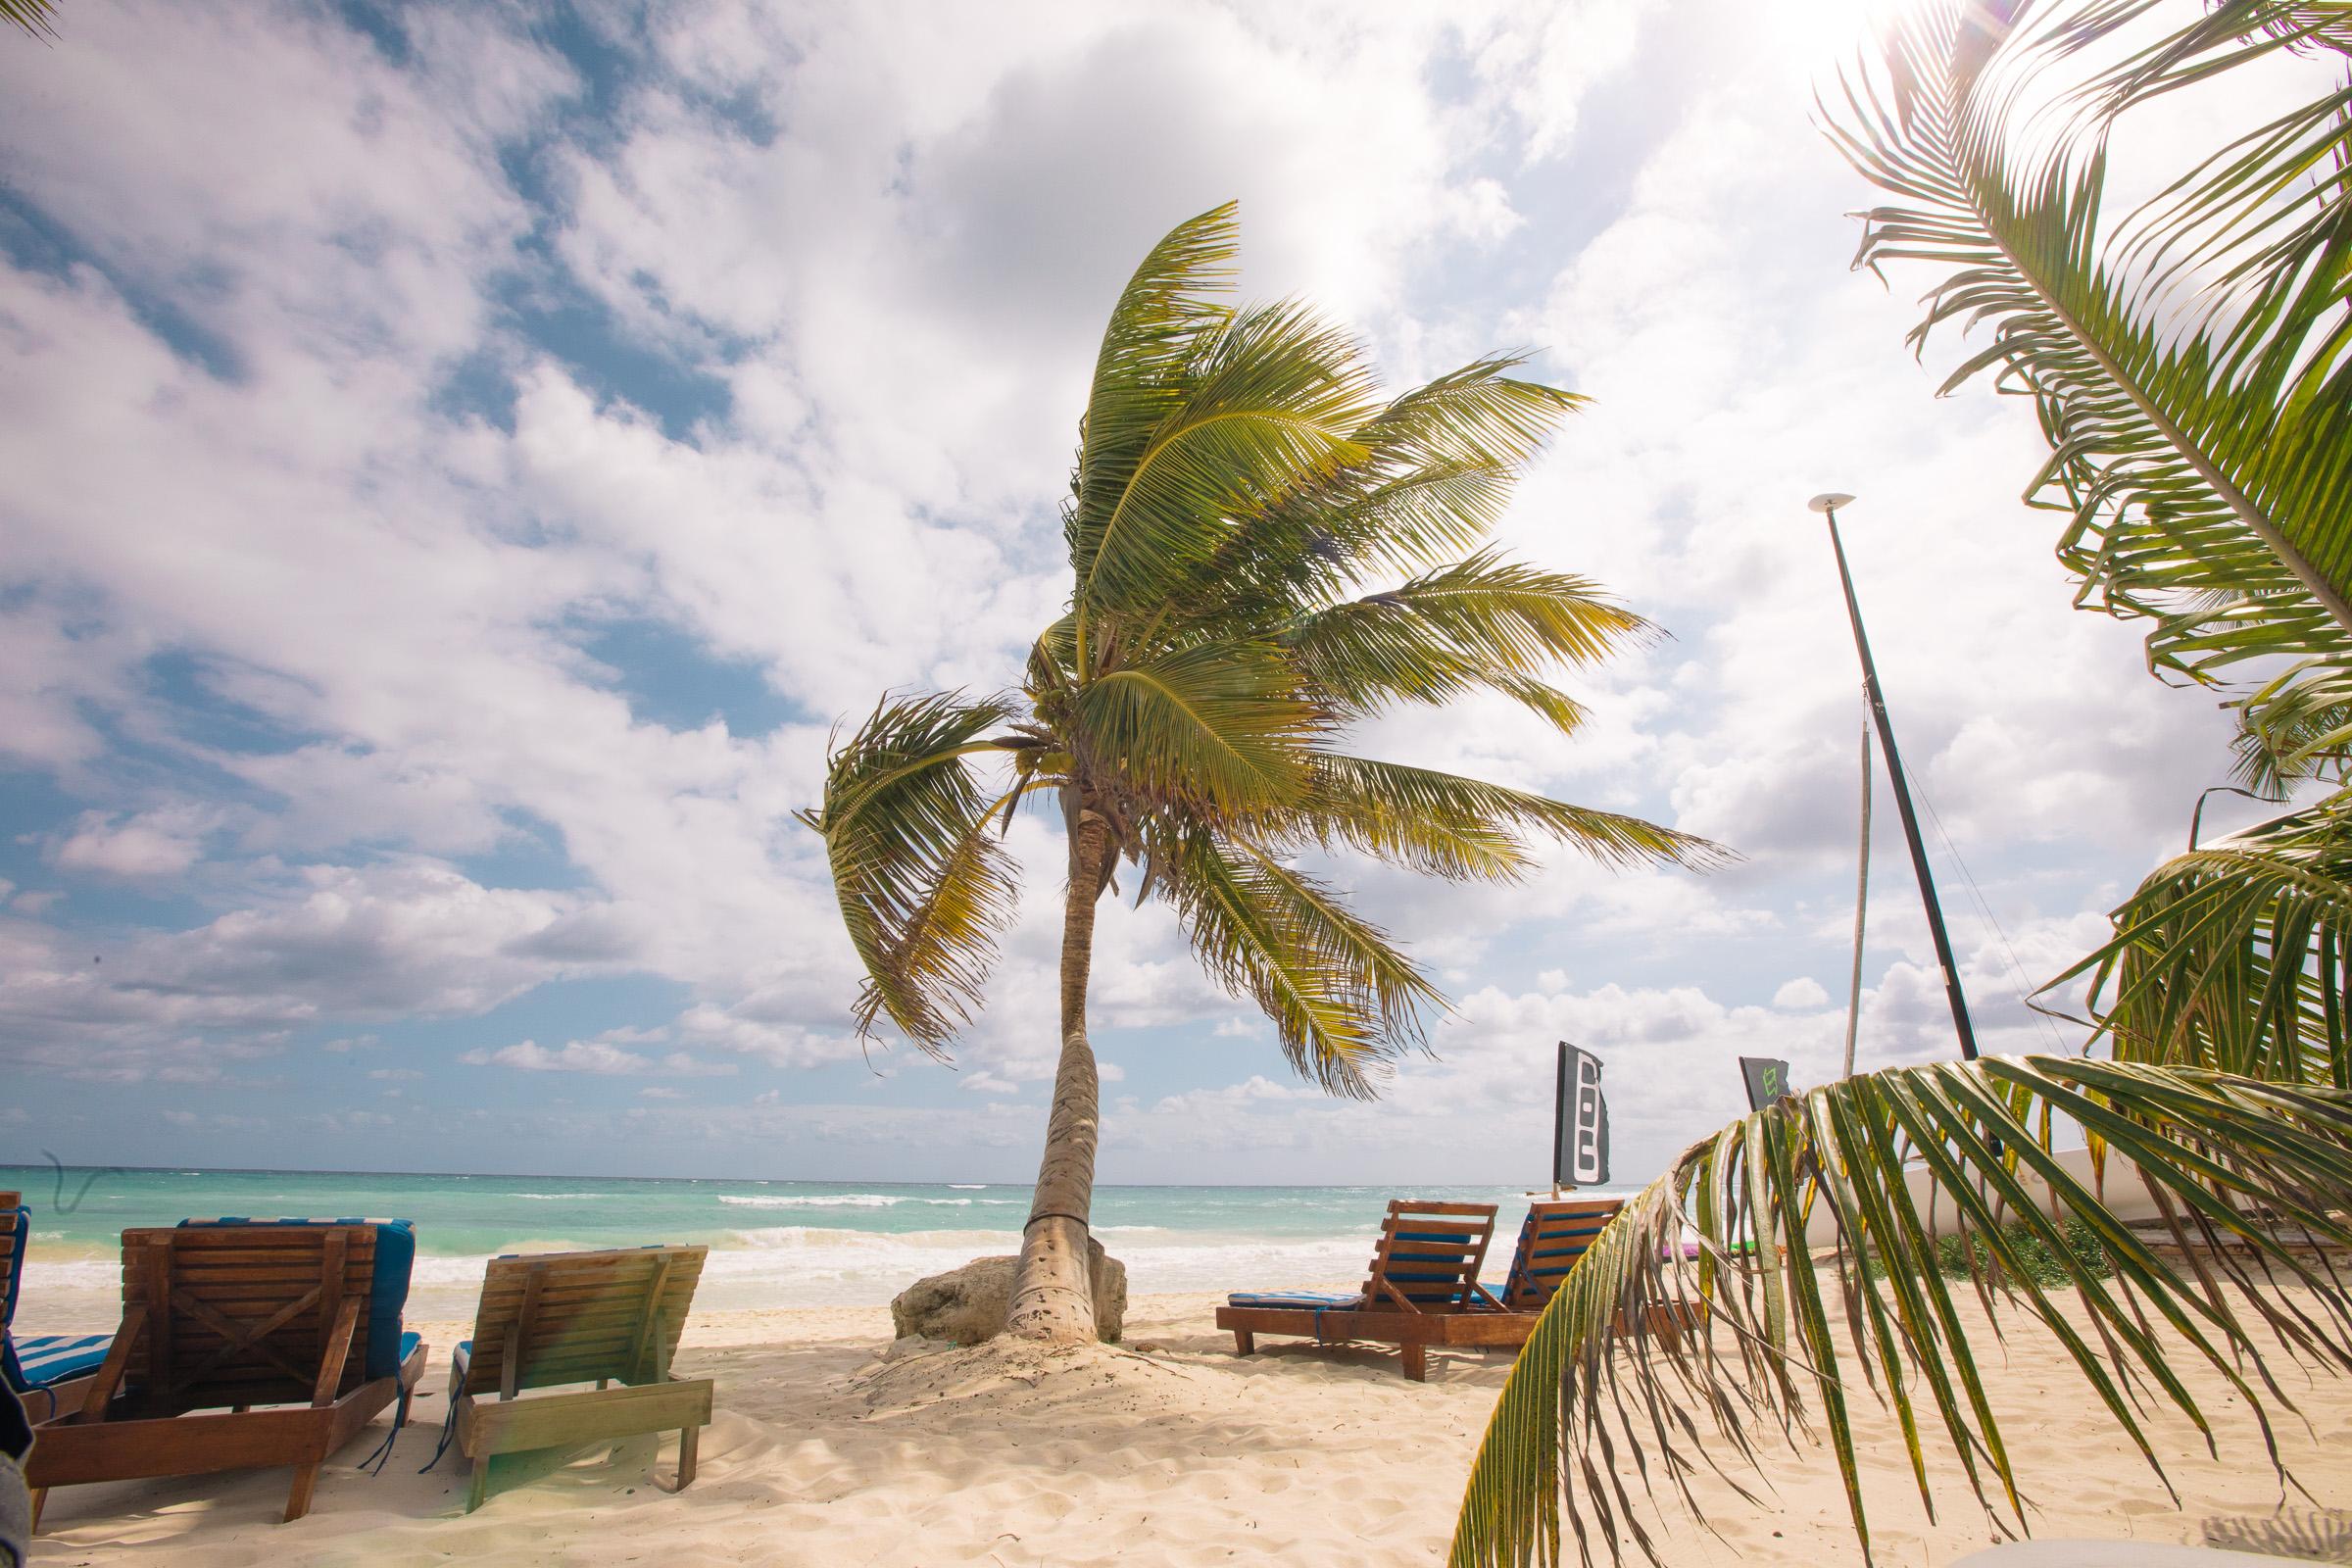 Schiefe Palme bei mäßigem Wetter